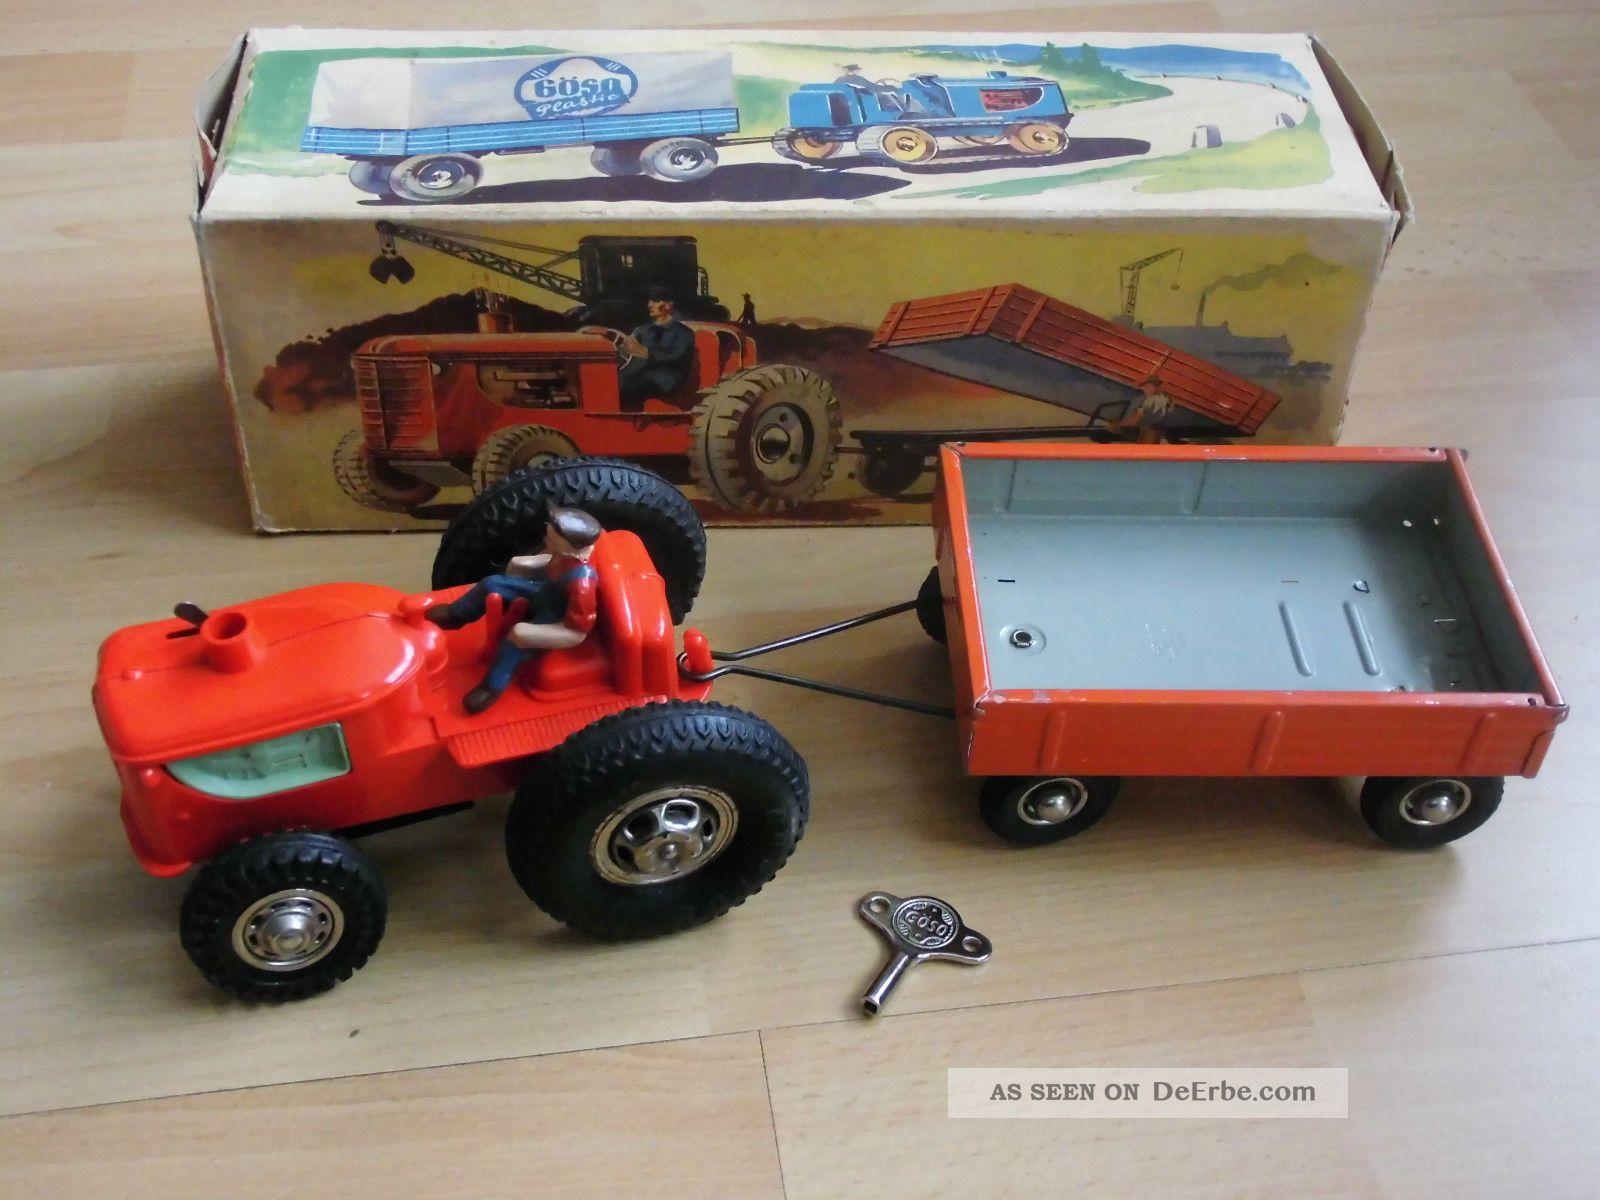 blechspielzeug g so traktor mit h nger im ok nahezu neuwertig. Black Bedroom Furniture Sets. Home Design Ideas